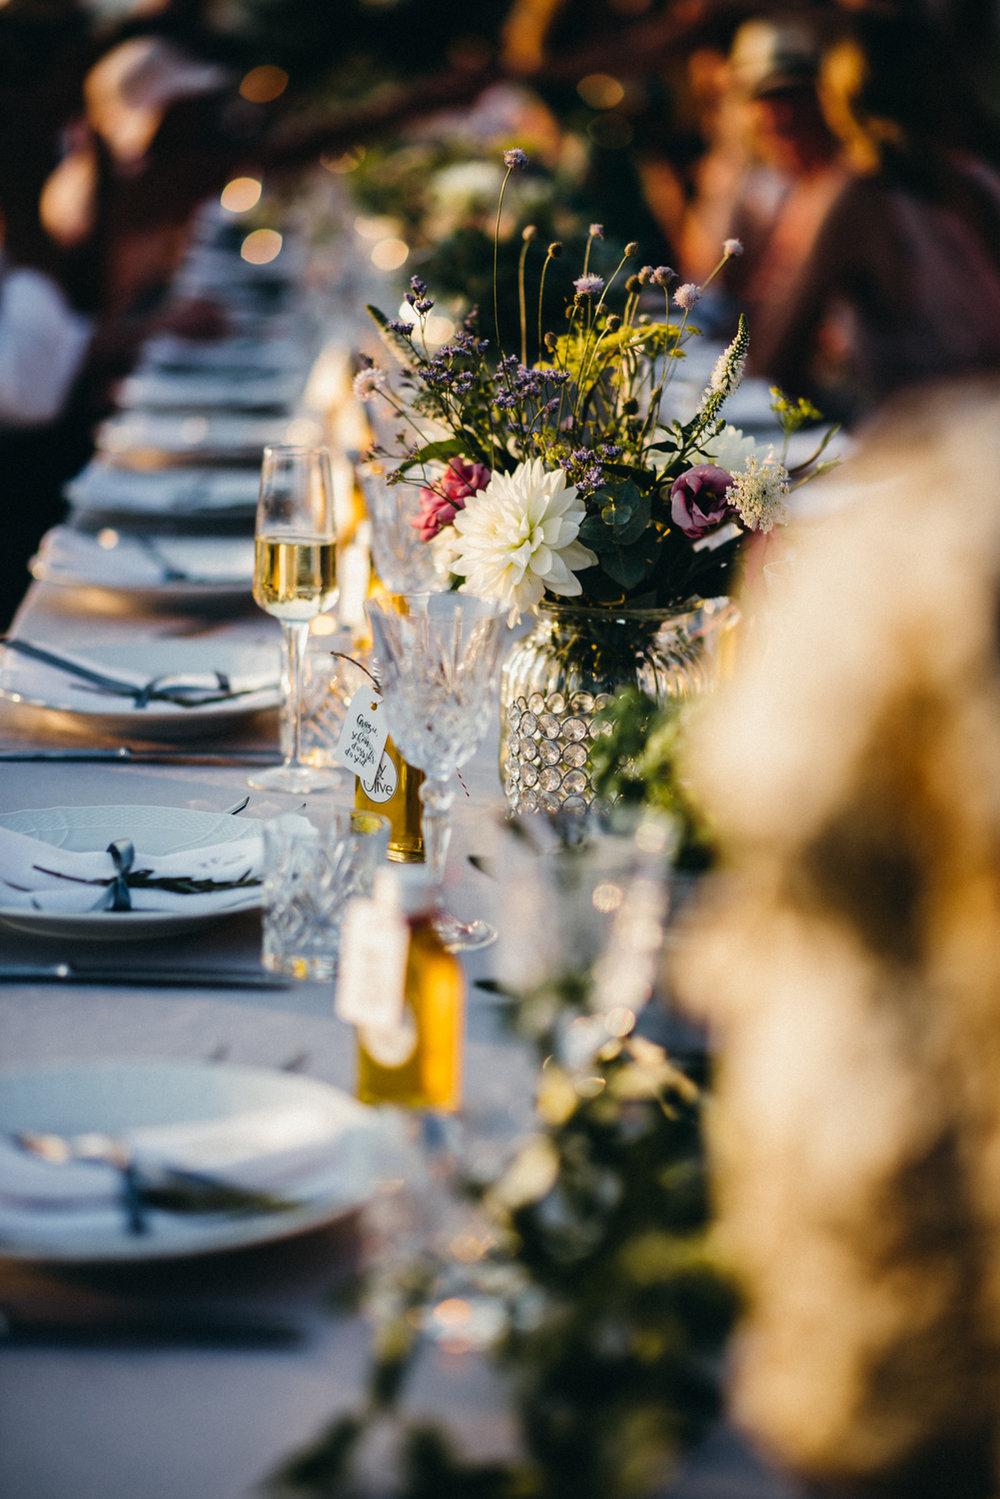 Hochzeitsreportage vogelsfotos Toskana Melli & Jan-069.jpg